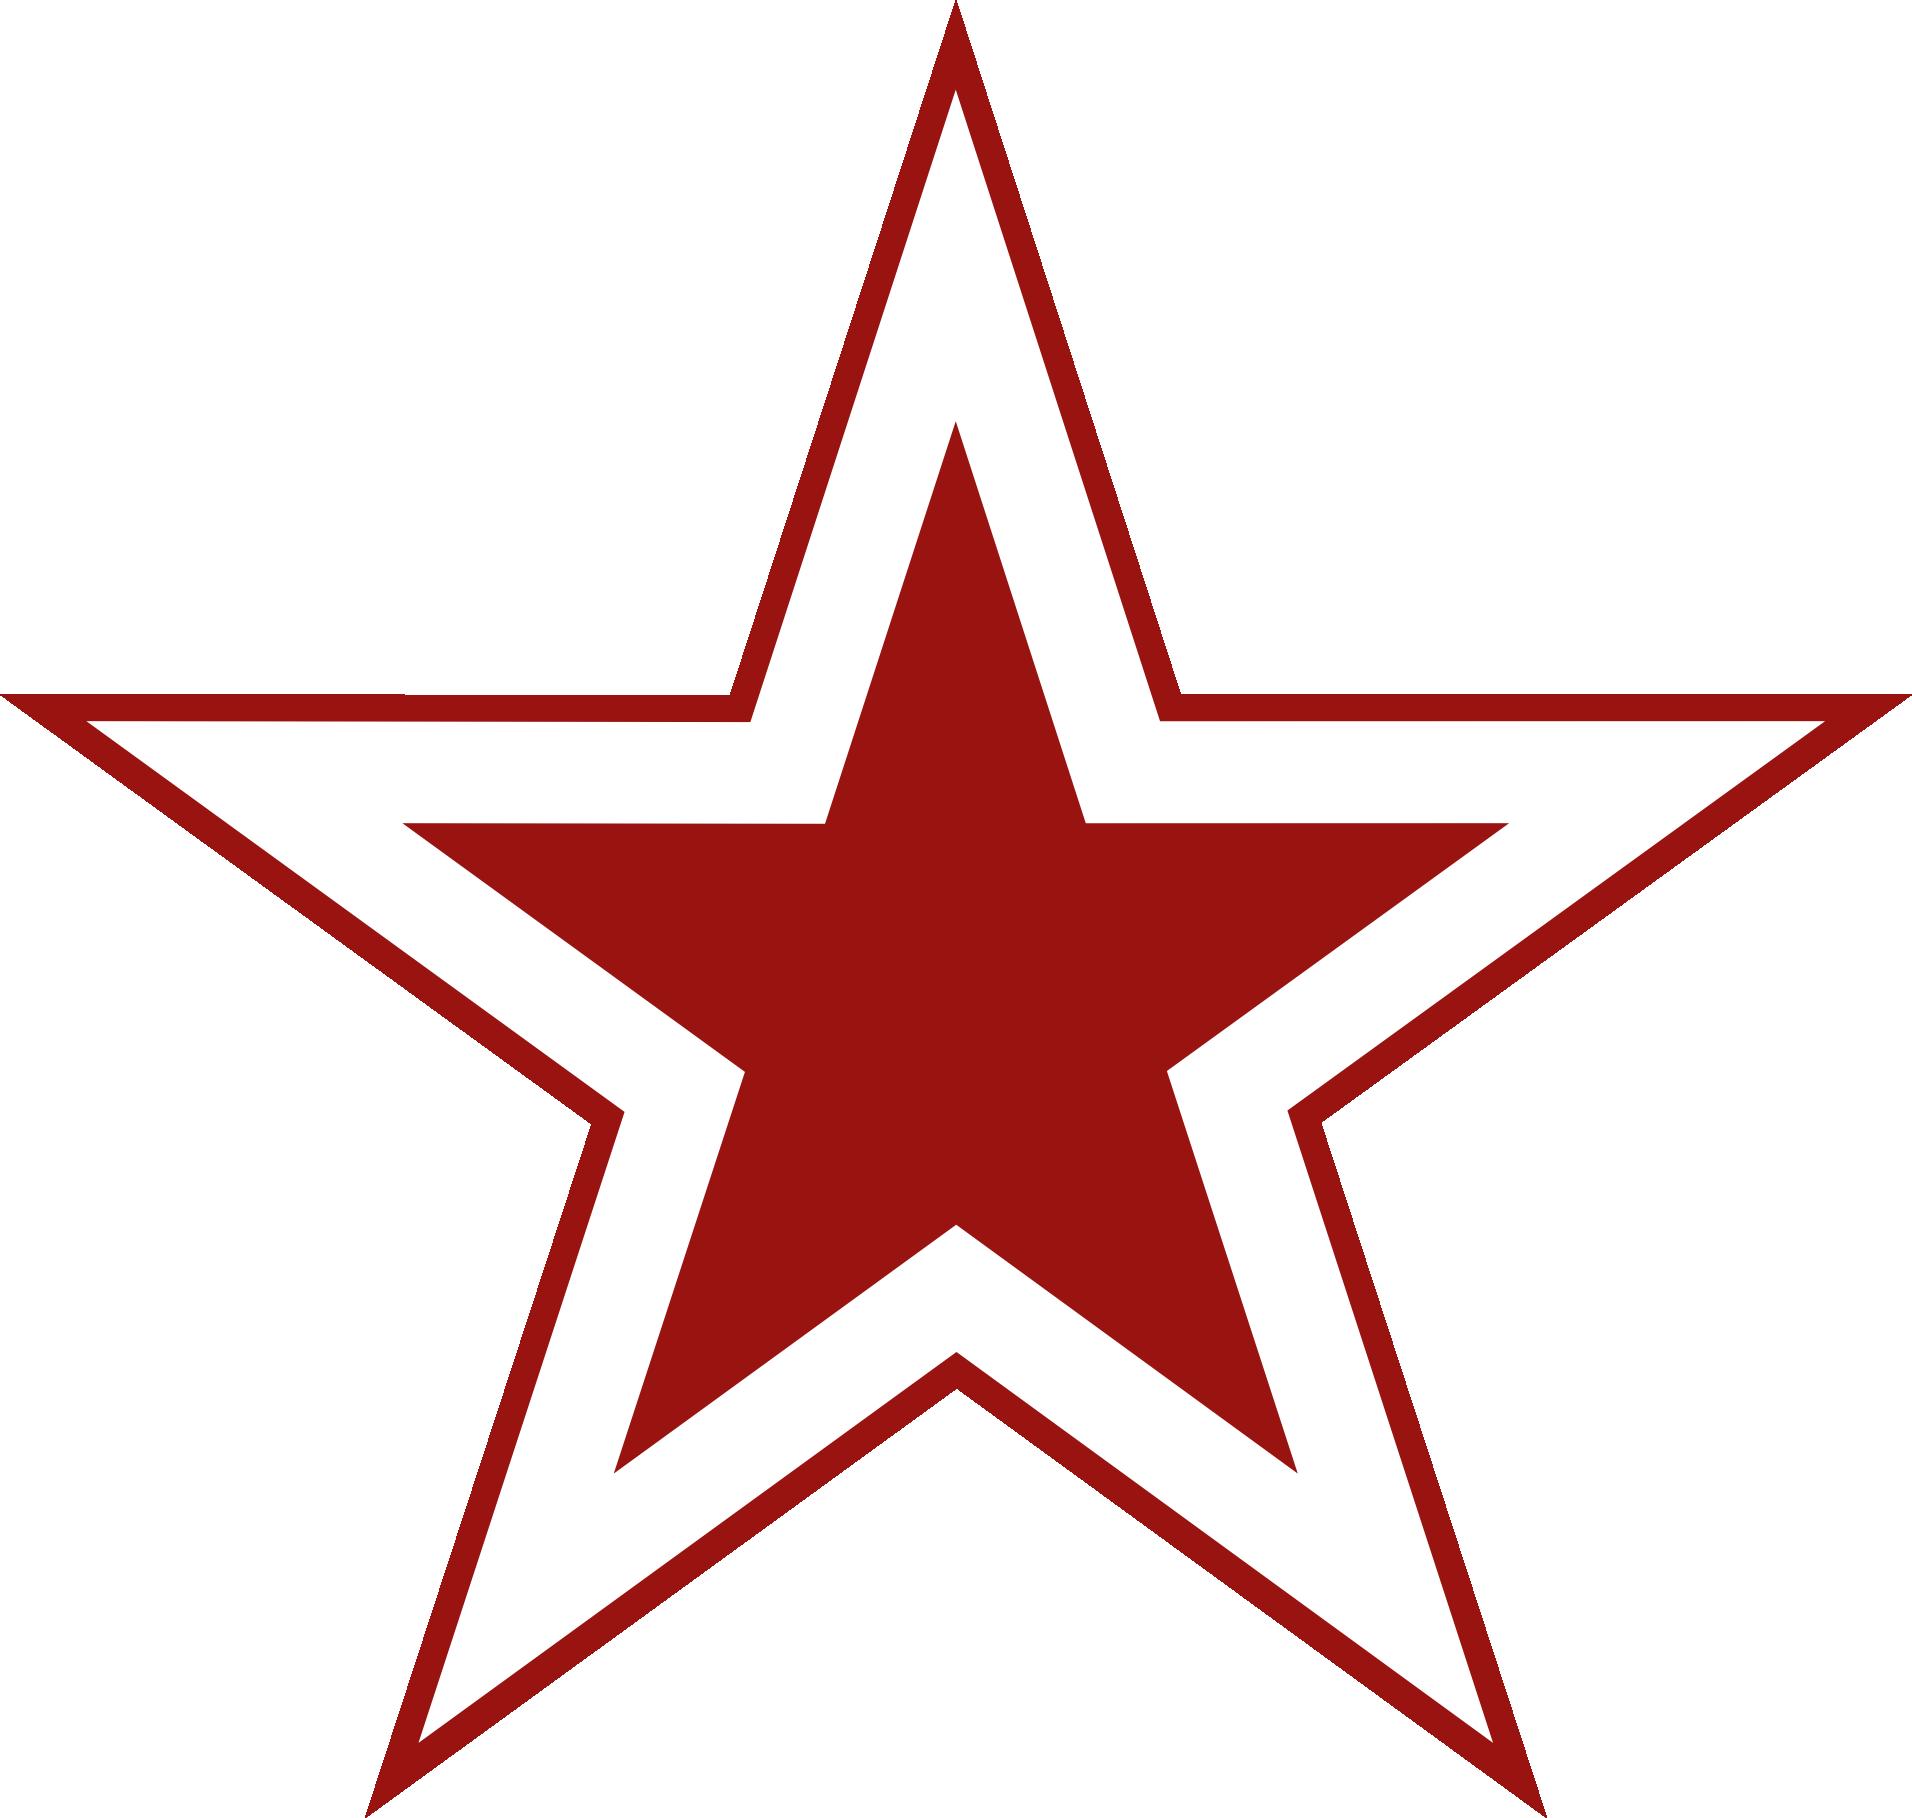 Soviet Union Russia Red star.